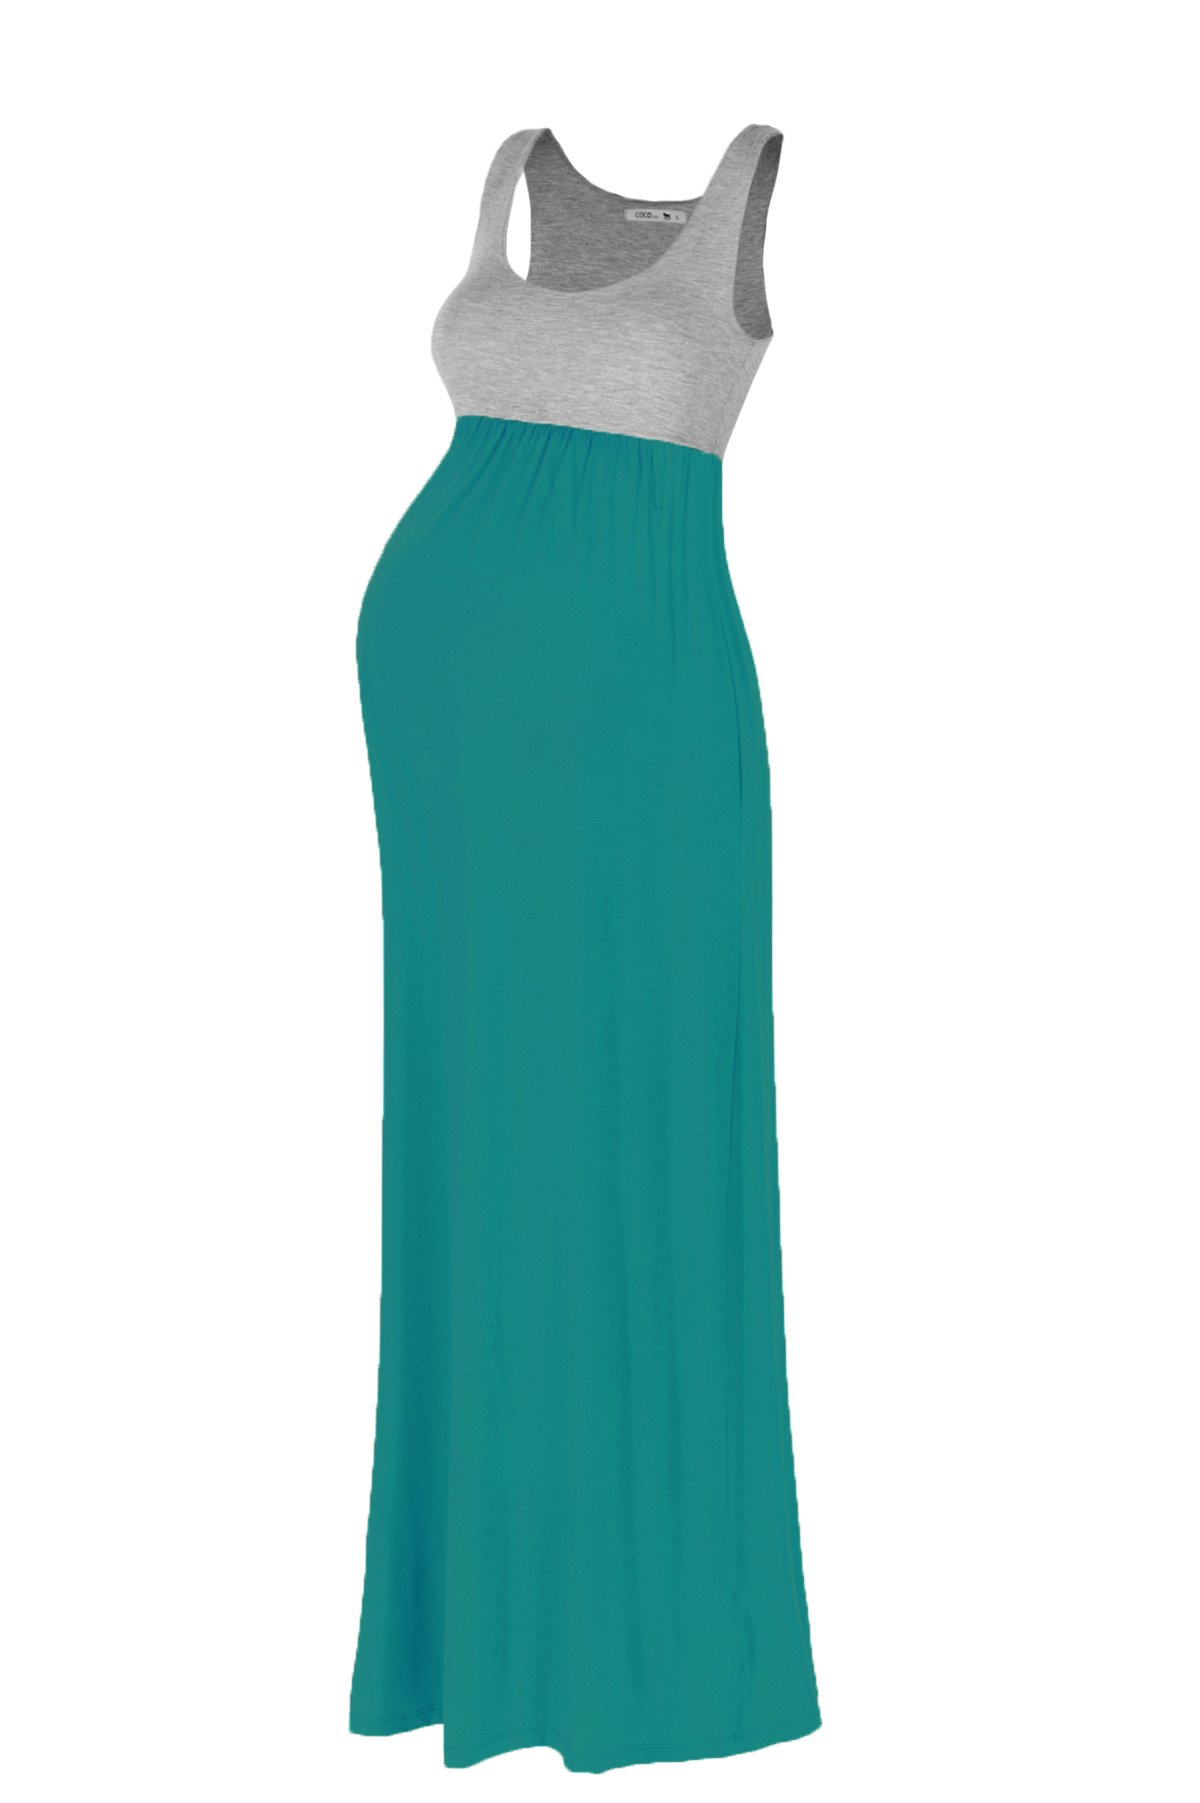 Beachcoco Women's Maternity Contrast Maxi Tank Dress (L, H.Grey/Jade)